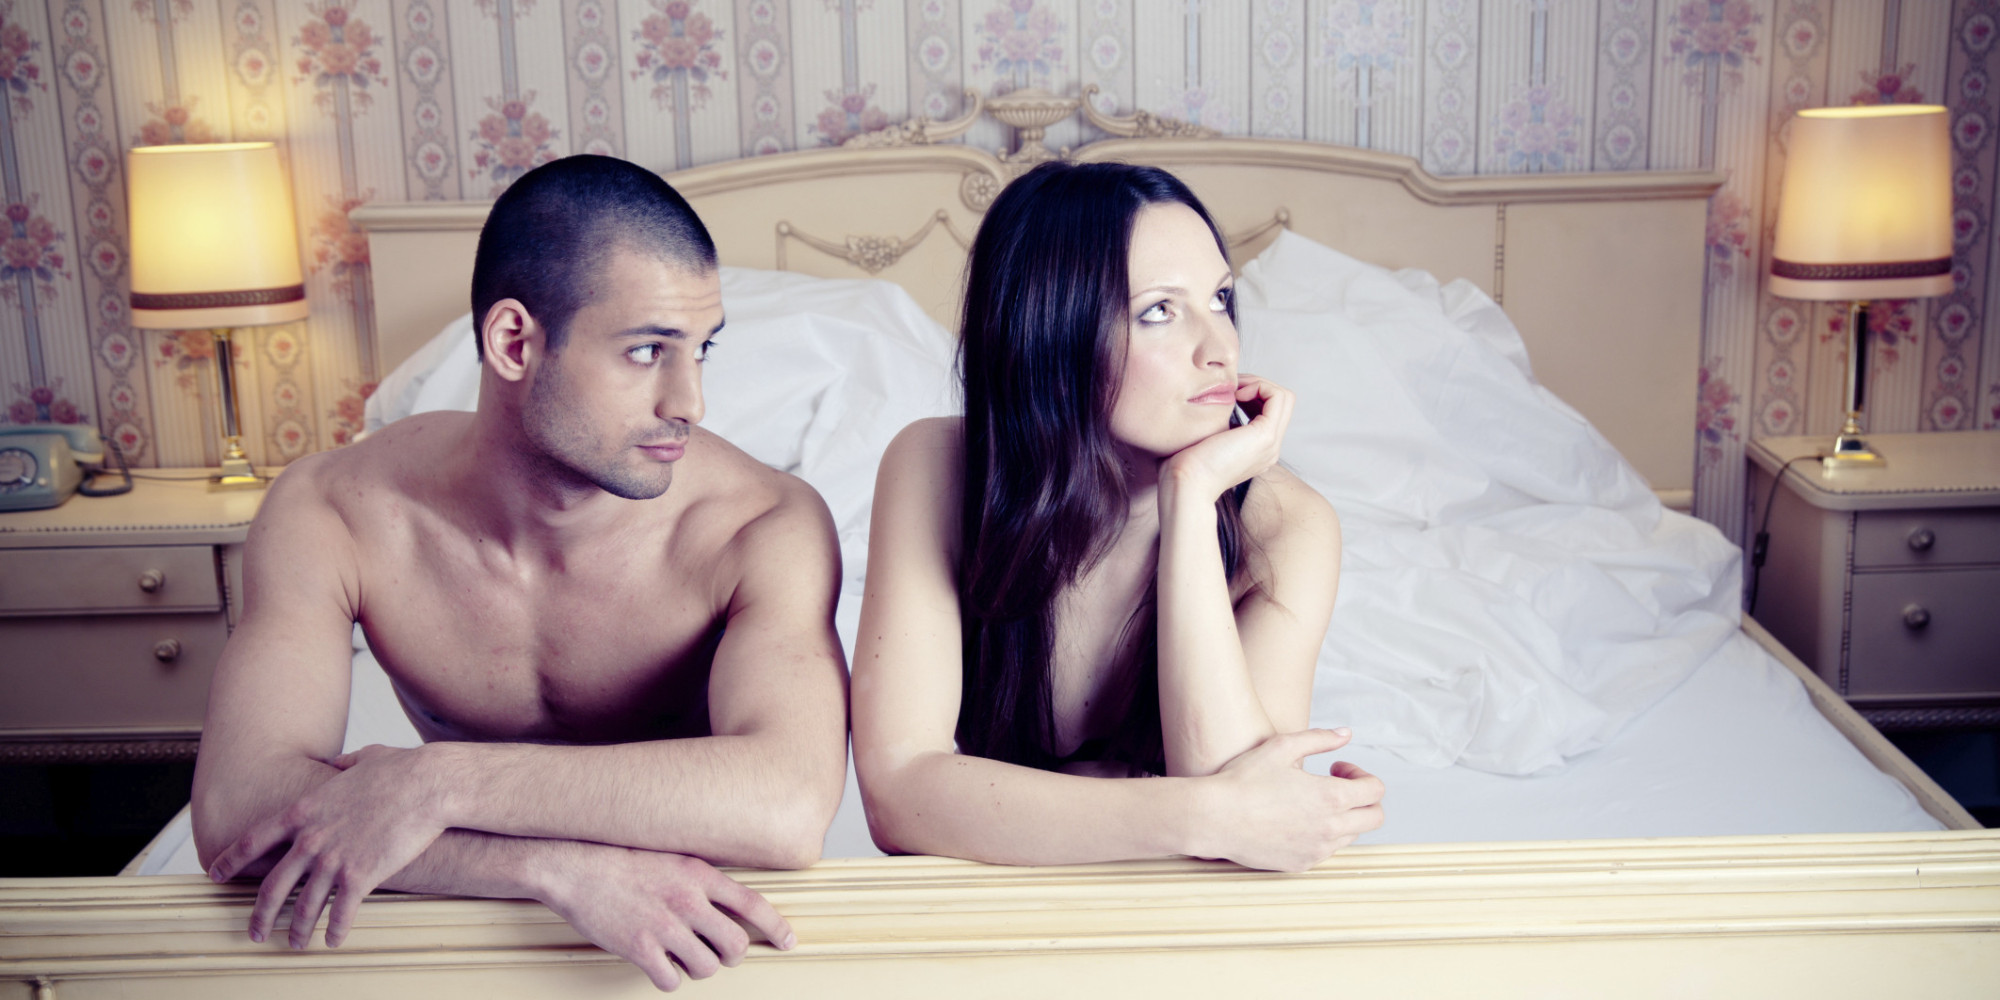 sex chat hellas london mann bordell